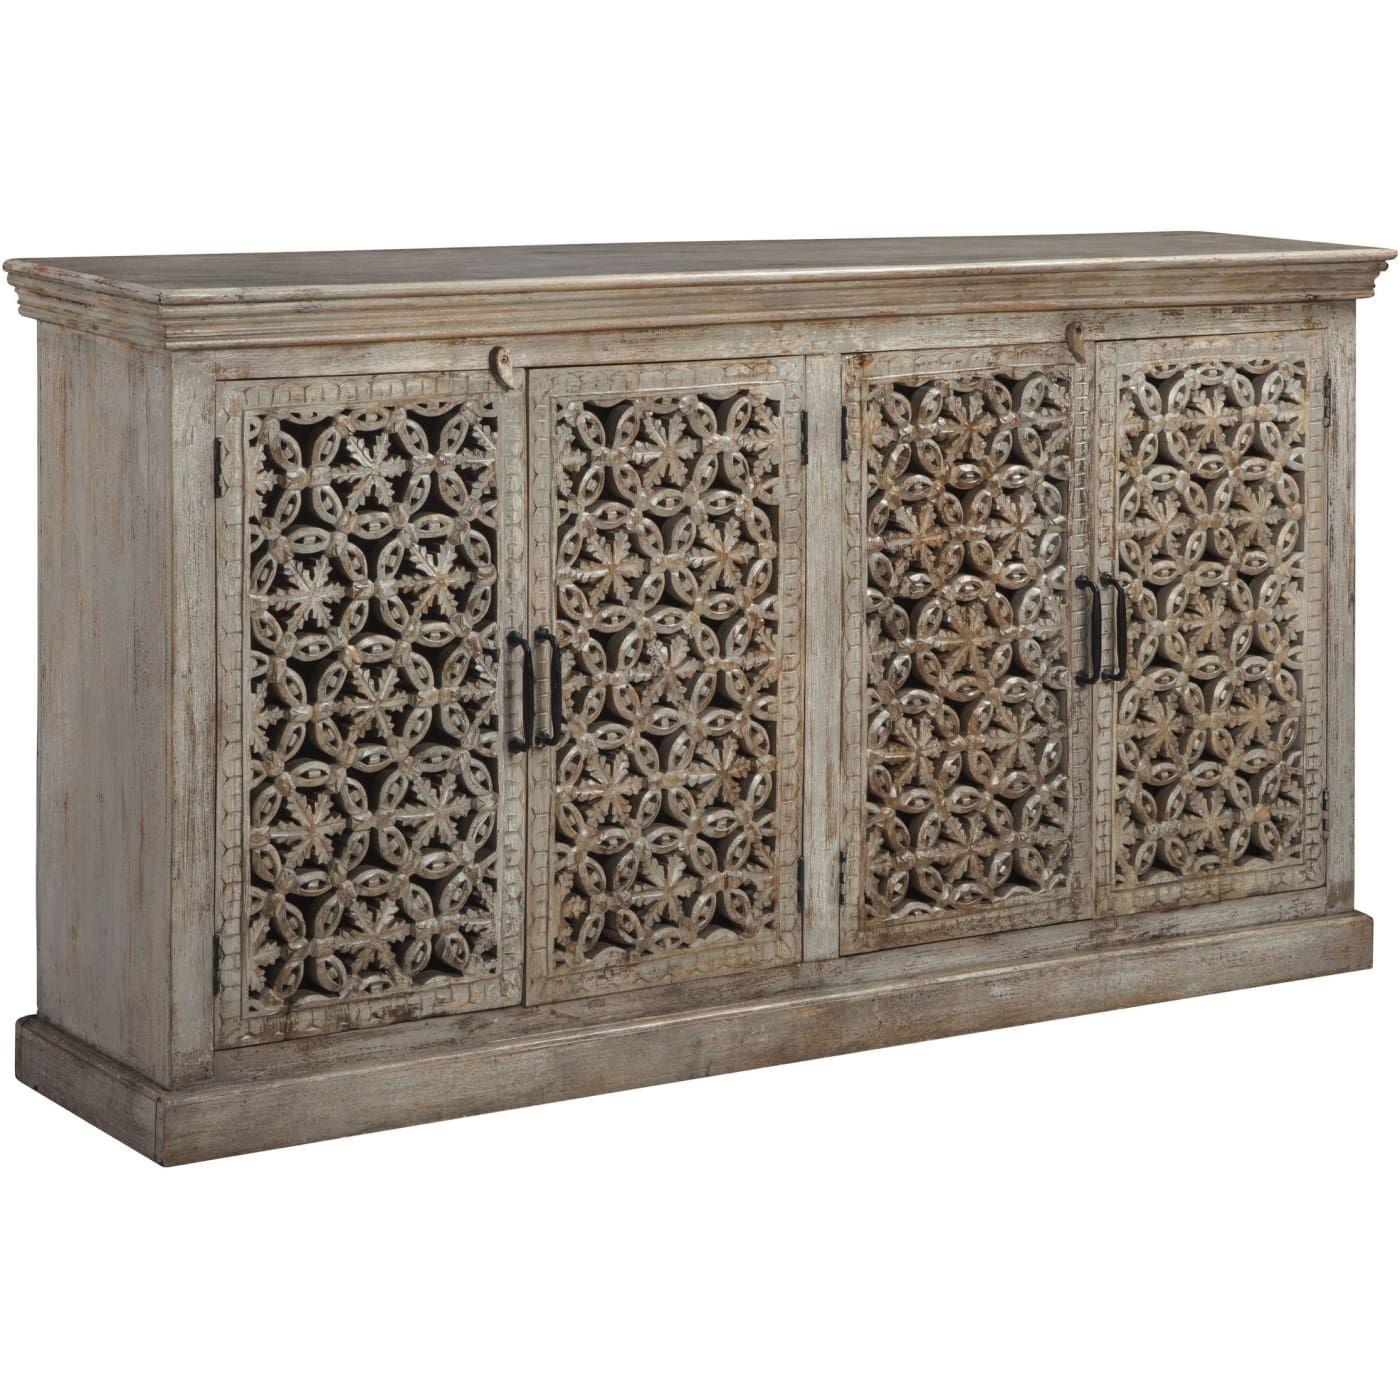 Fossil Ridge Amber Accent Cabinet Signature Design By Ashley Signature Design Ashley Furniture Industries